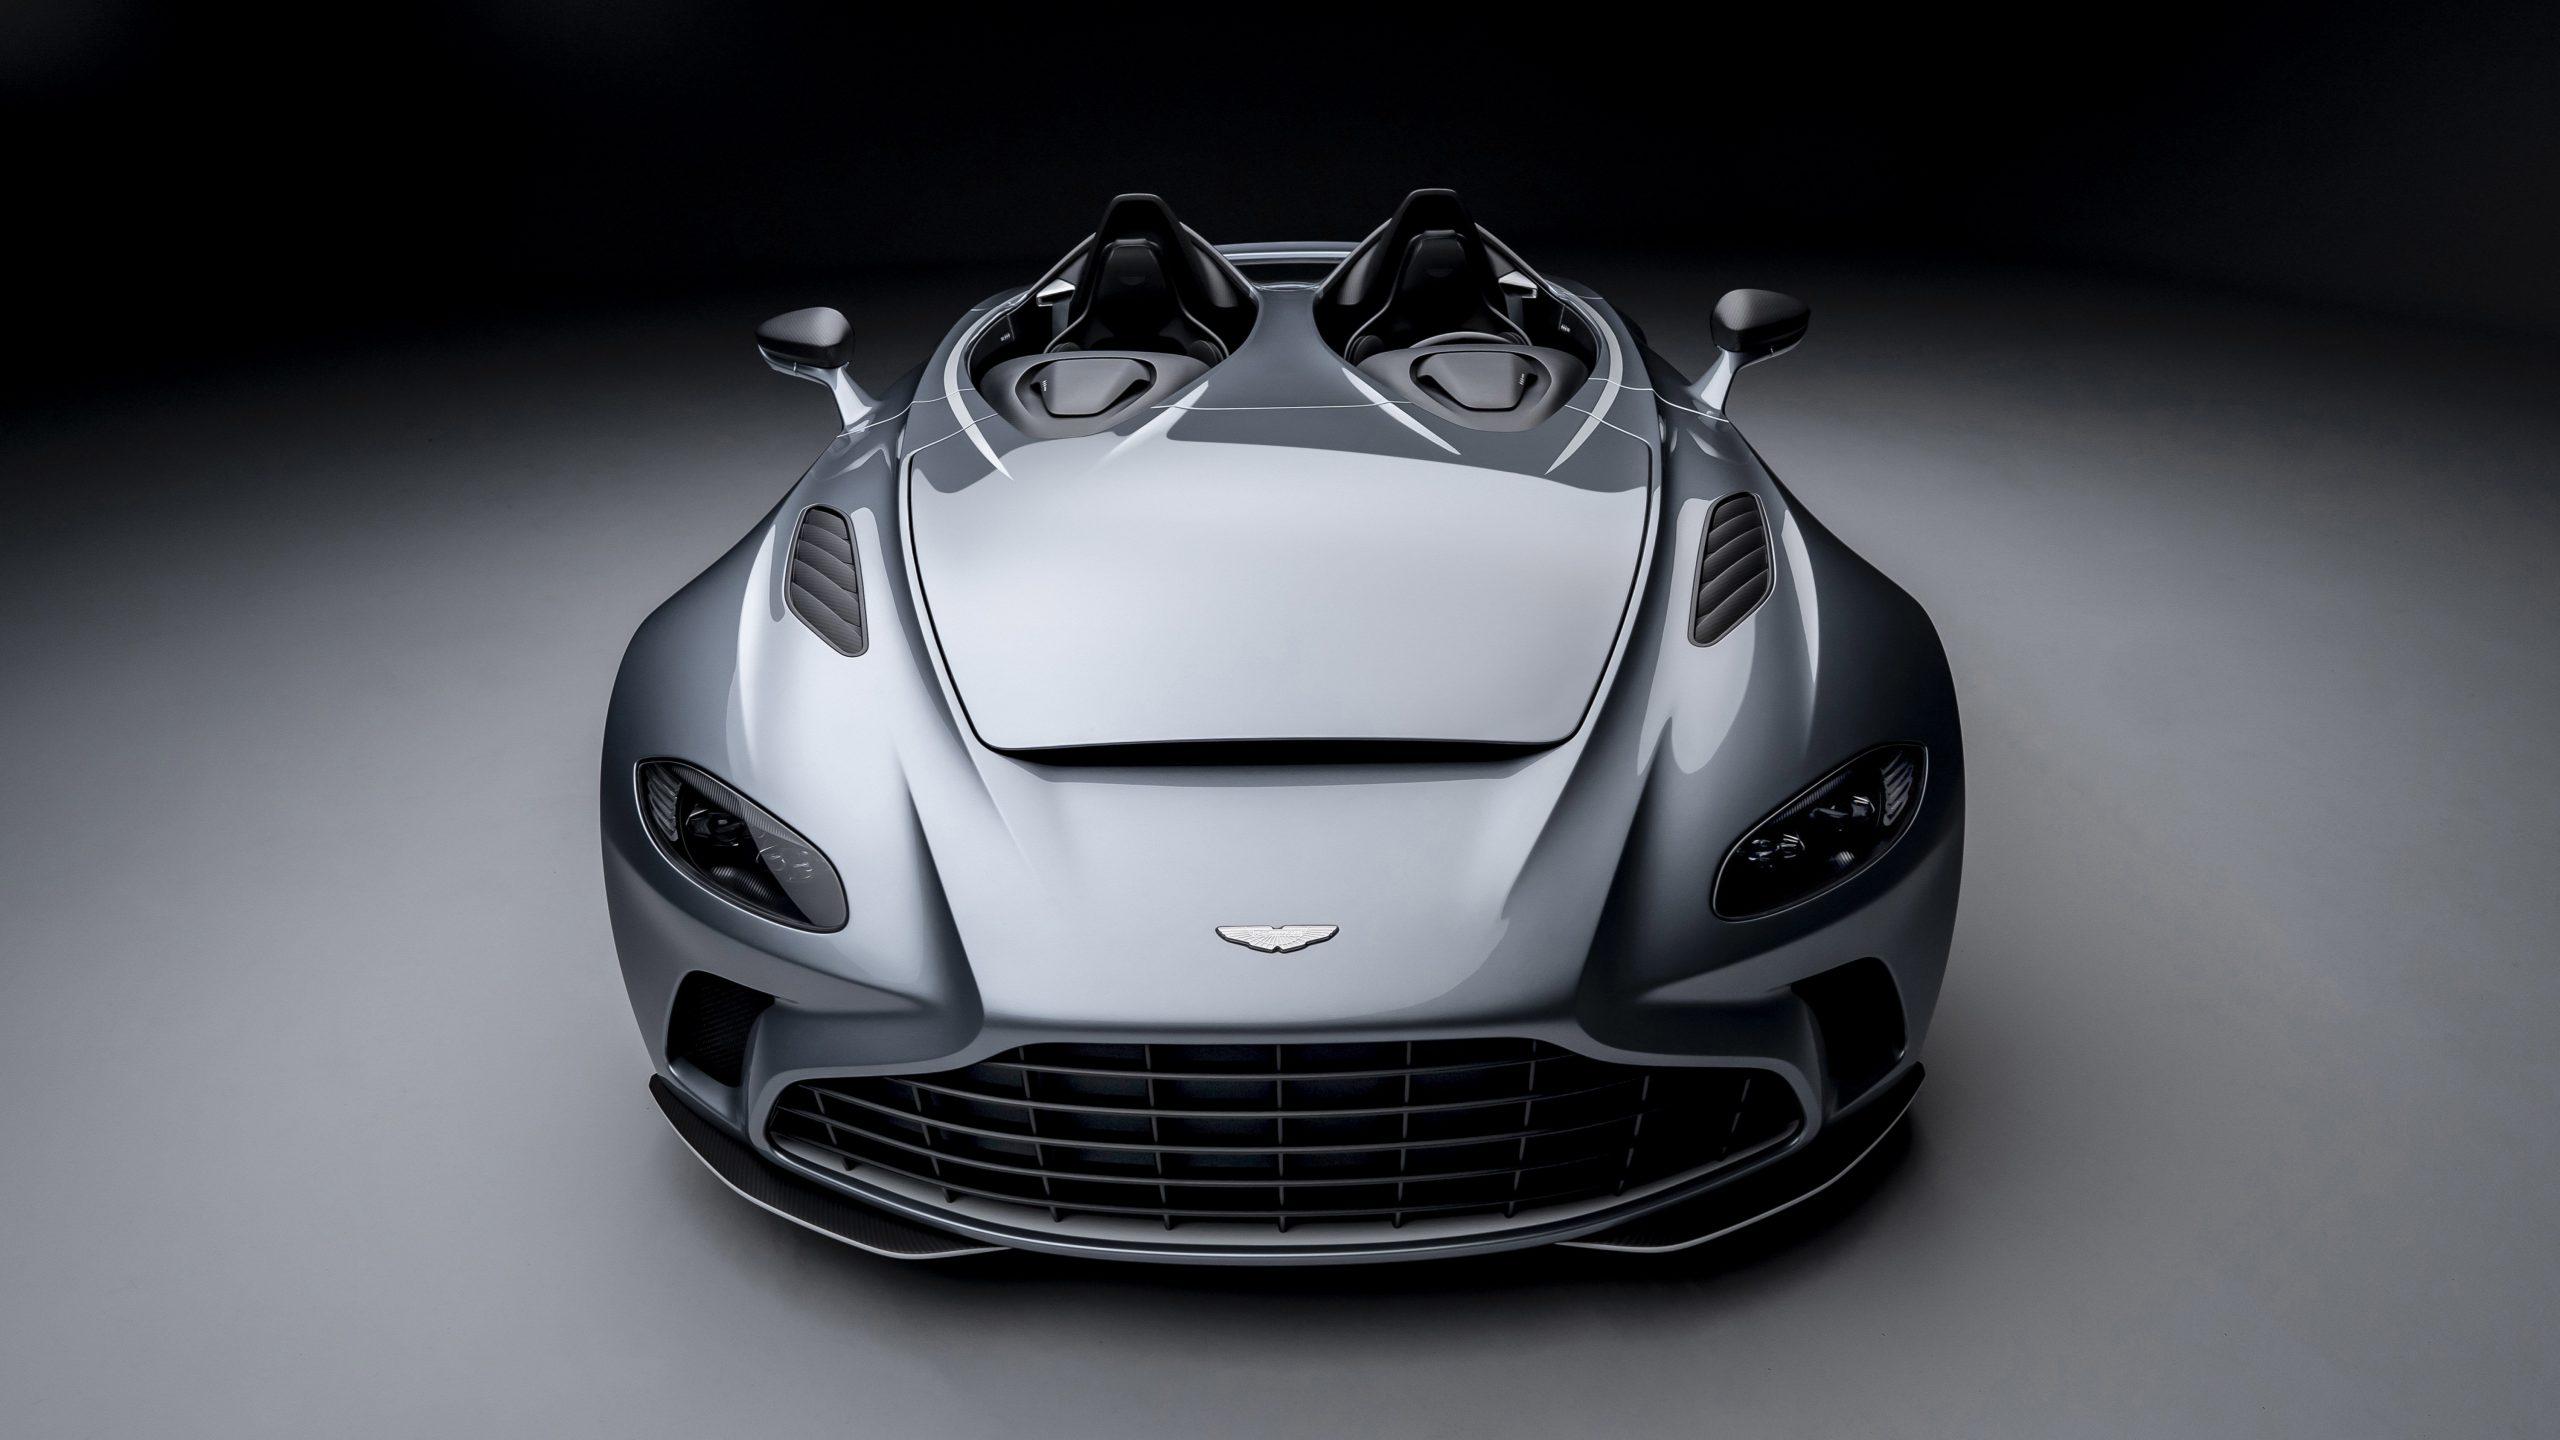 2020 Geneva Electric Motor Program Editors' Picks|Autoblog